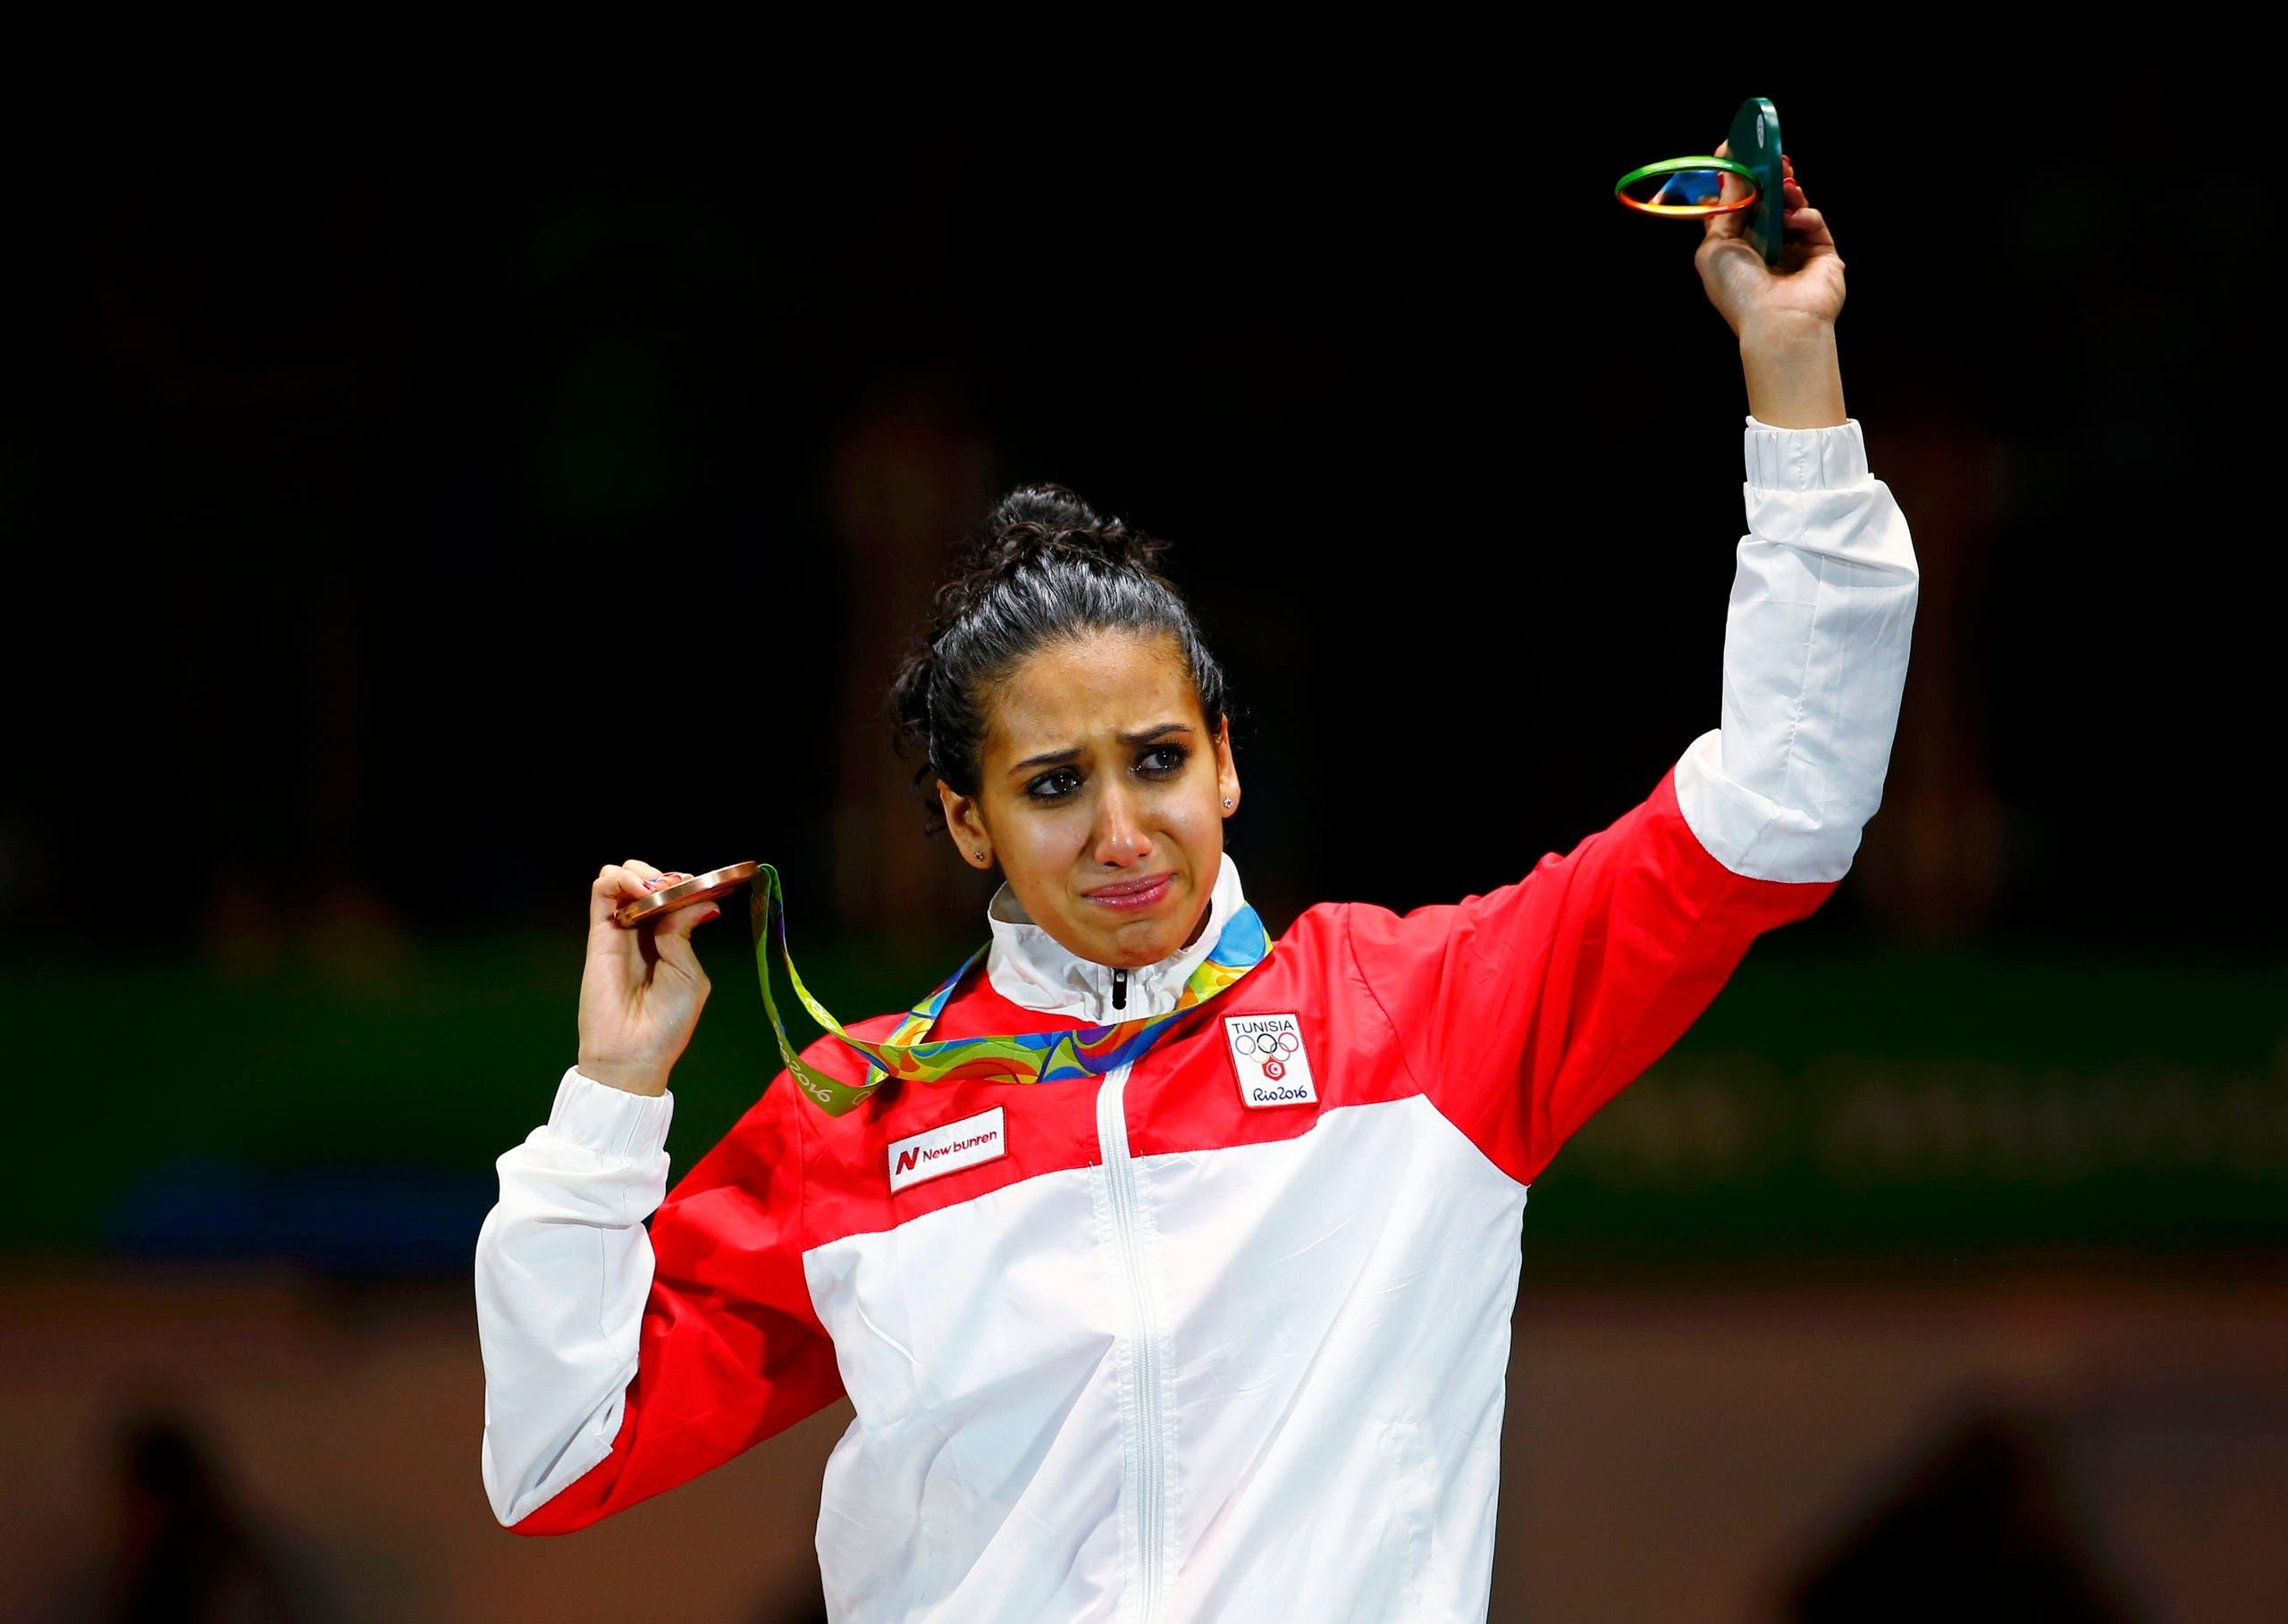 Ines Boubakri (TUN) of Tunisia celebrates winning the bronze medal. REUTERS